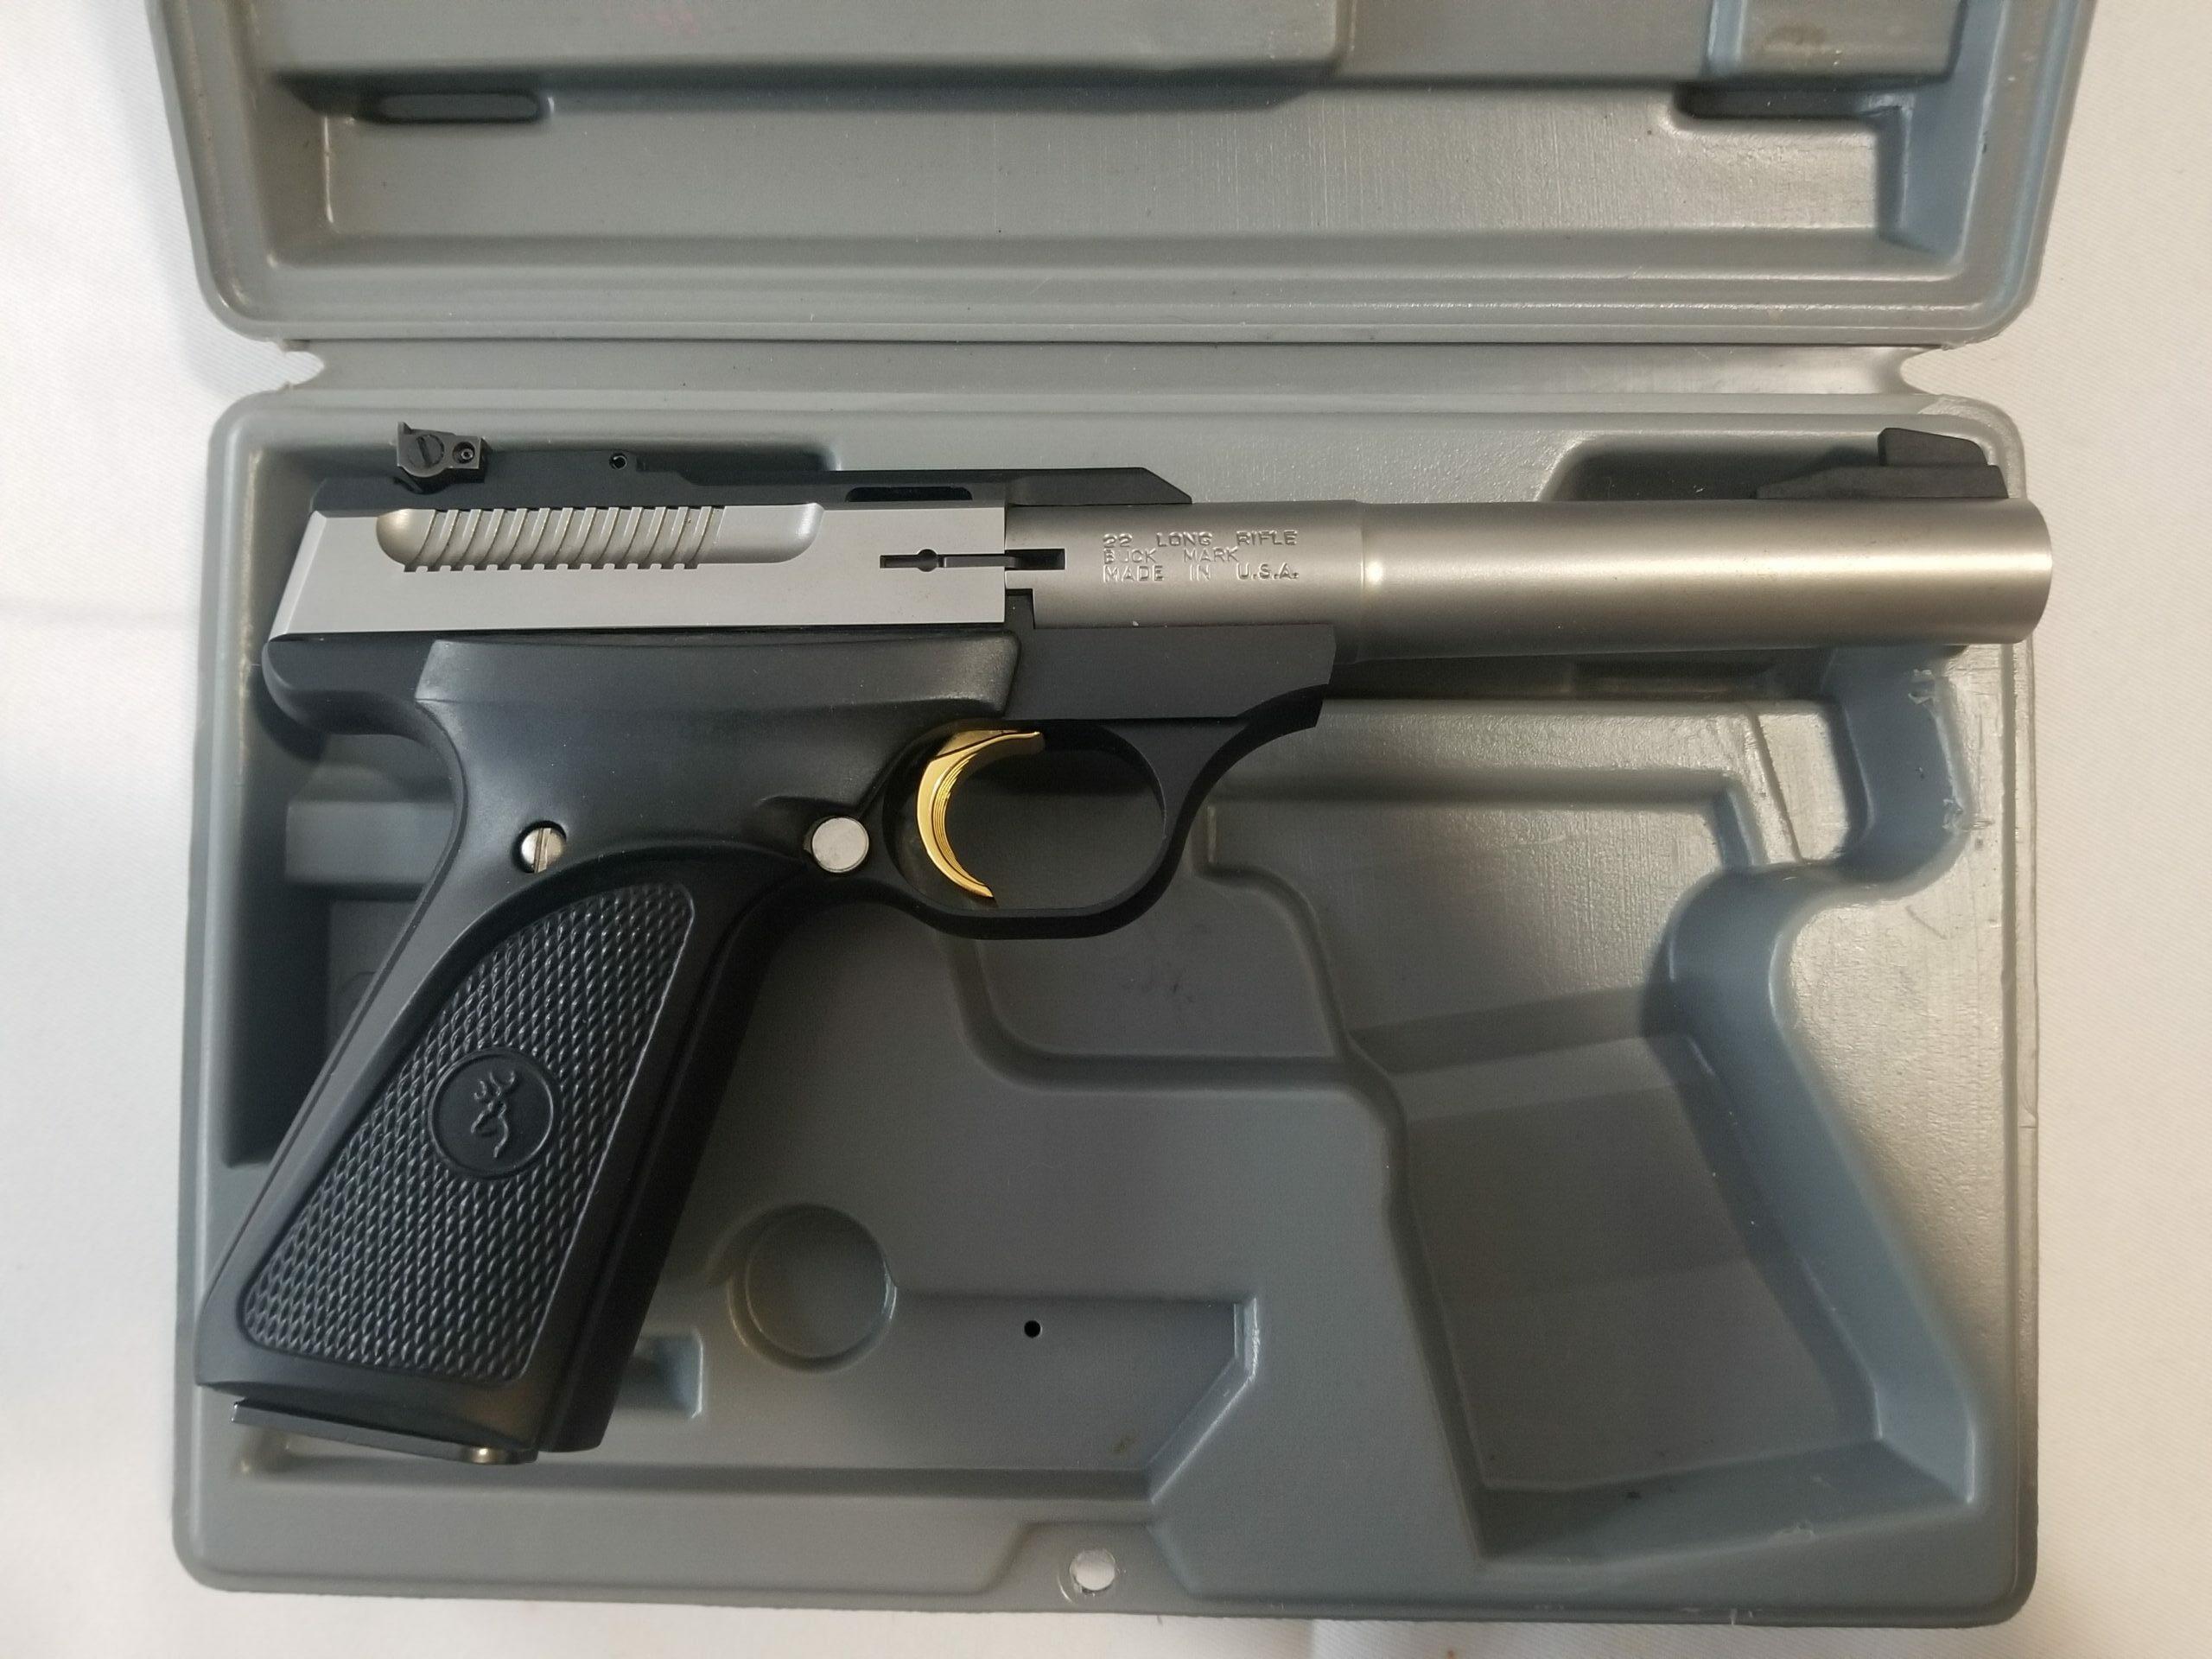 Browning Buck Mark .22 Caliber Semi-Auto Target Pistol